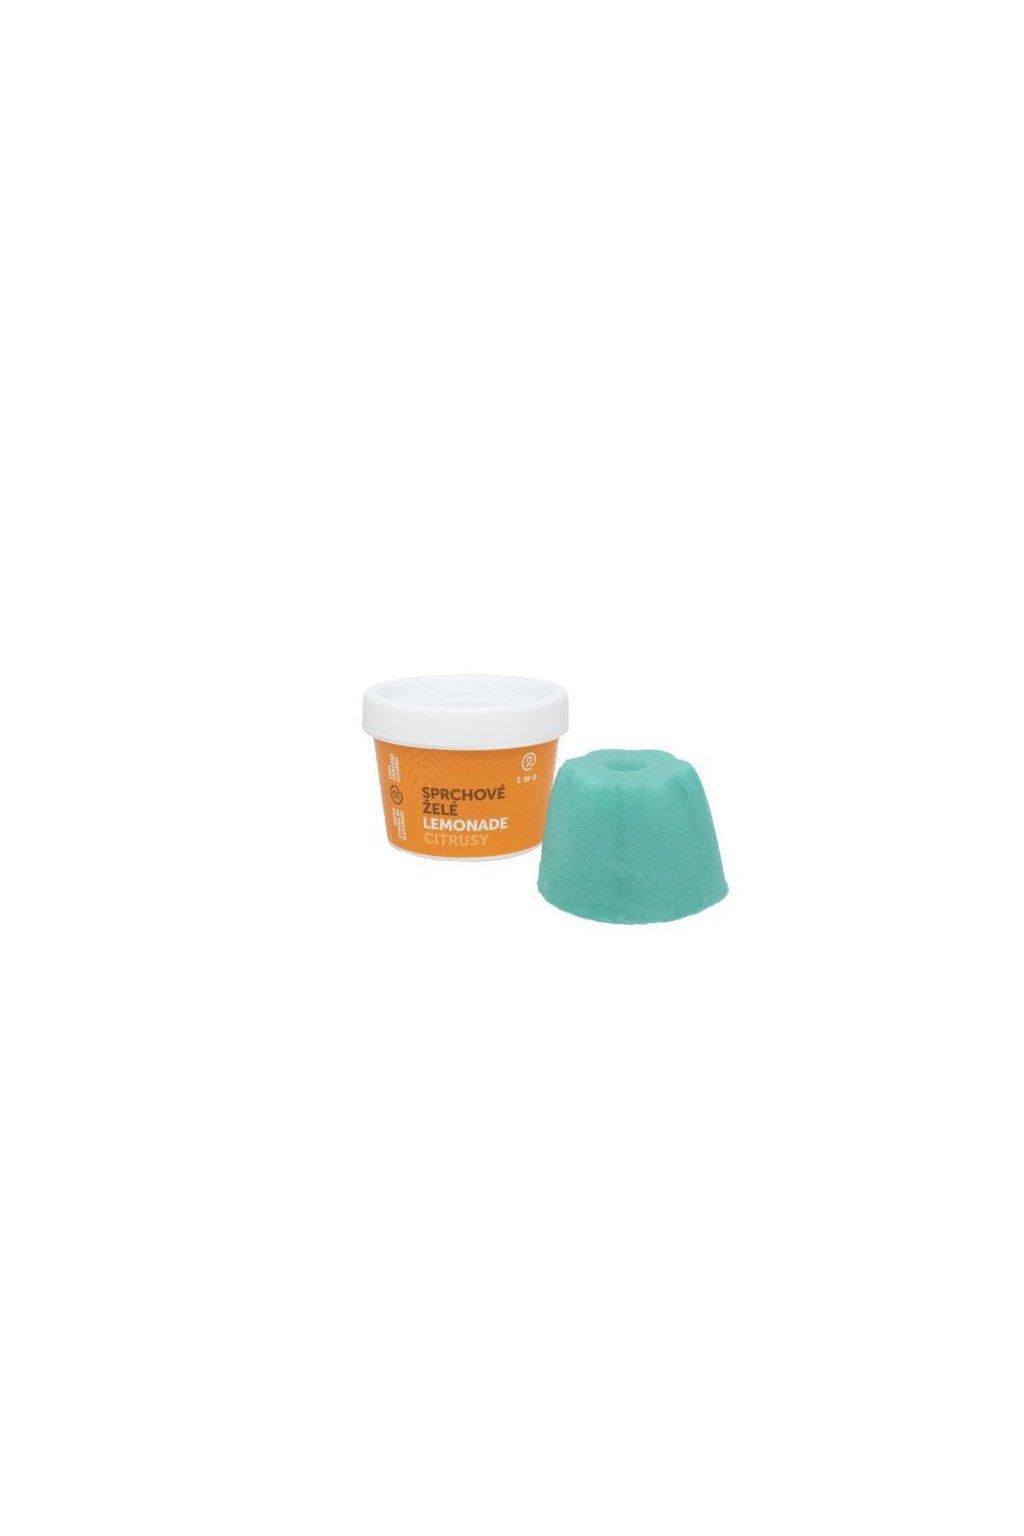 8981 two cosmetics sprchove zele lemonade citrusy 100 g